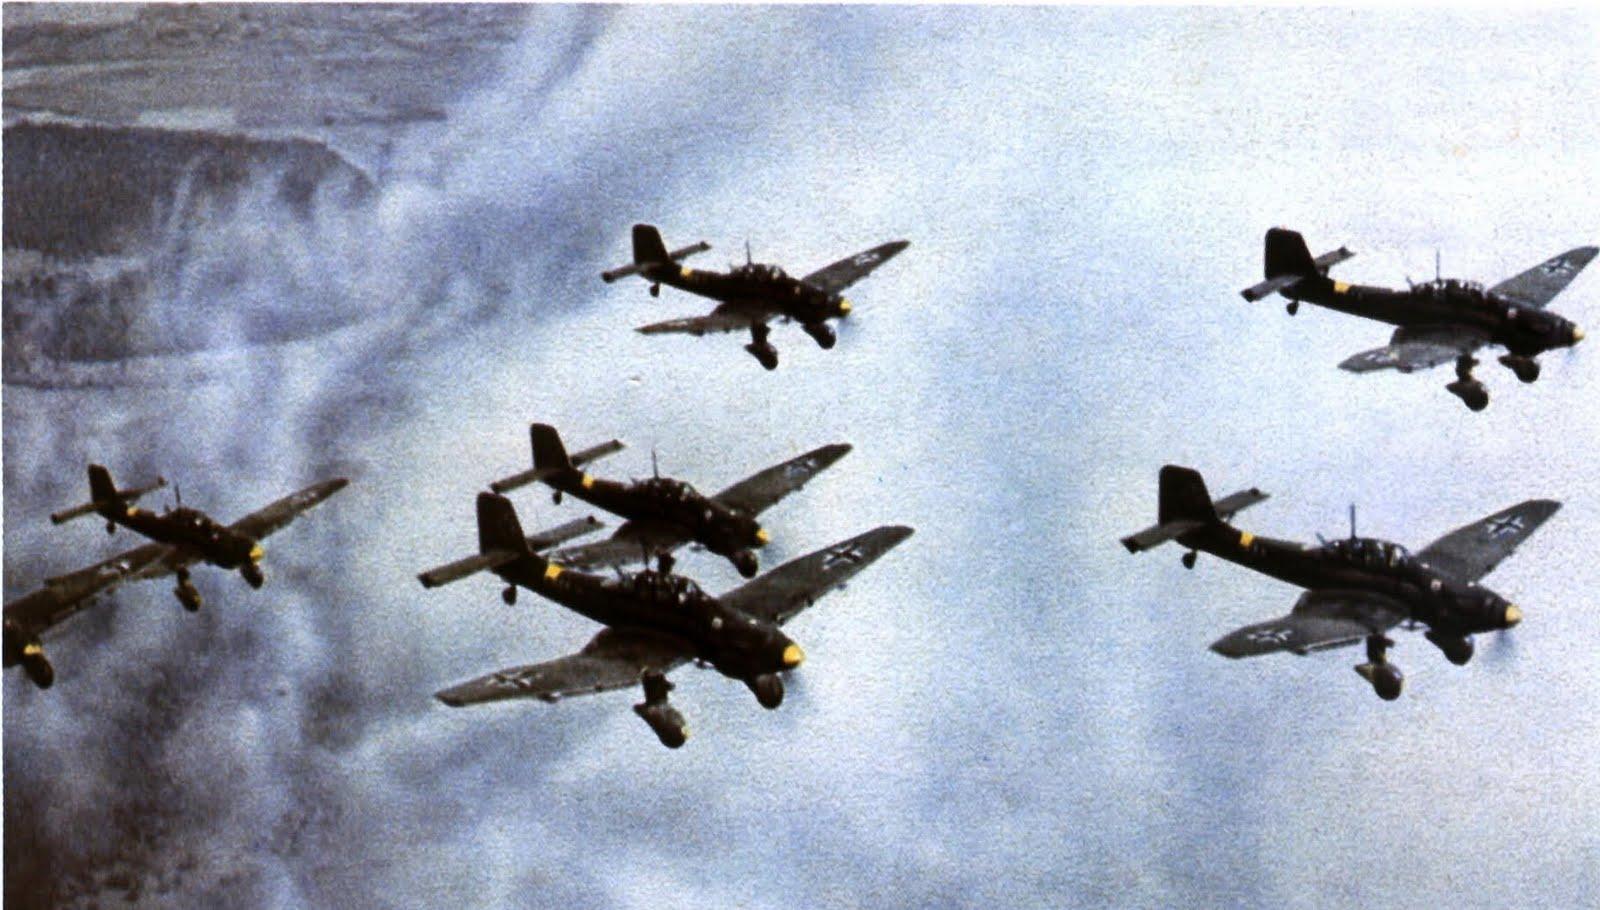 Junkers%2BJu%2B87Ds%2Bin%2Bflight%2Bover